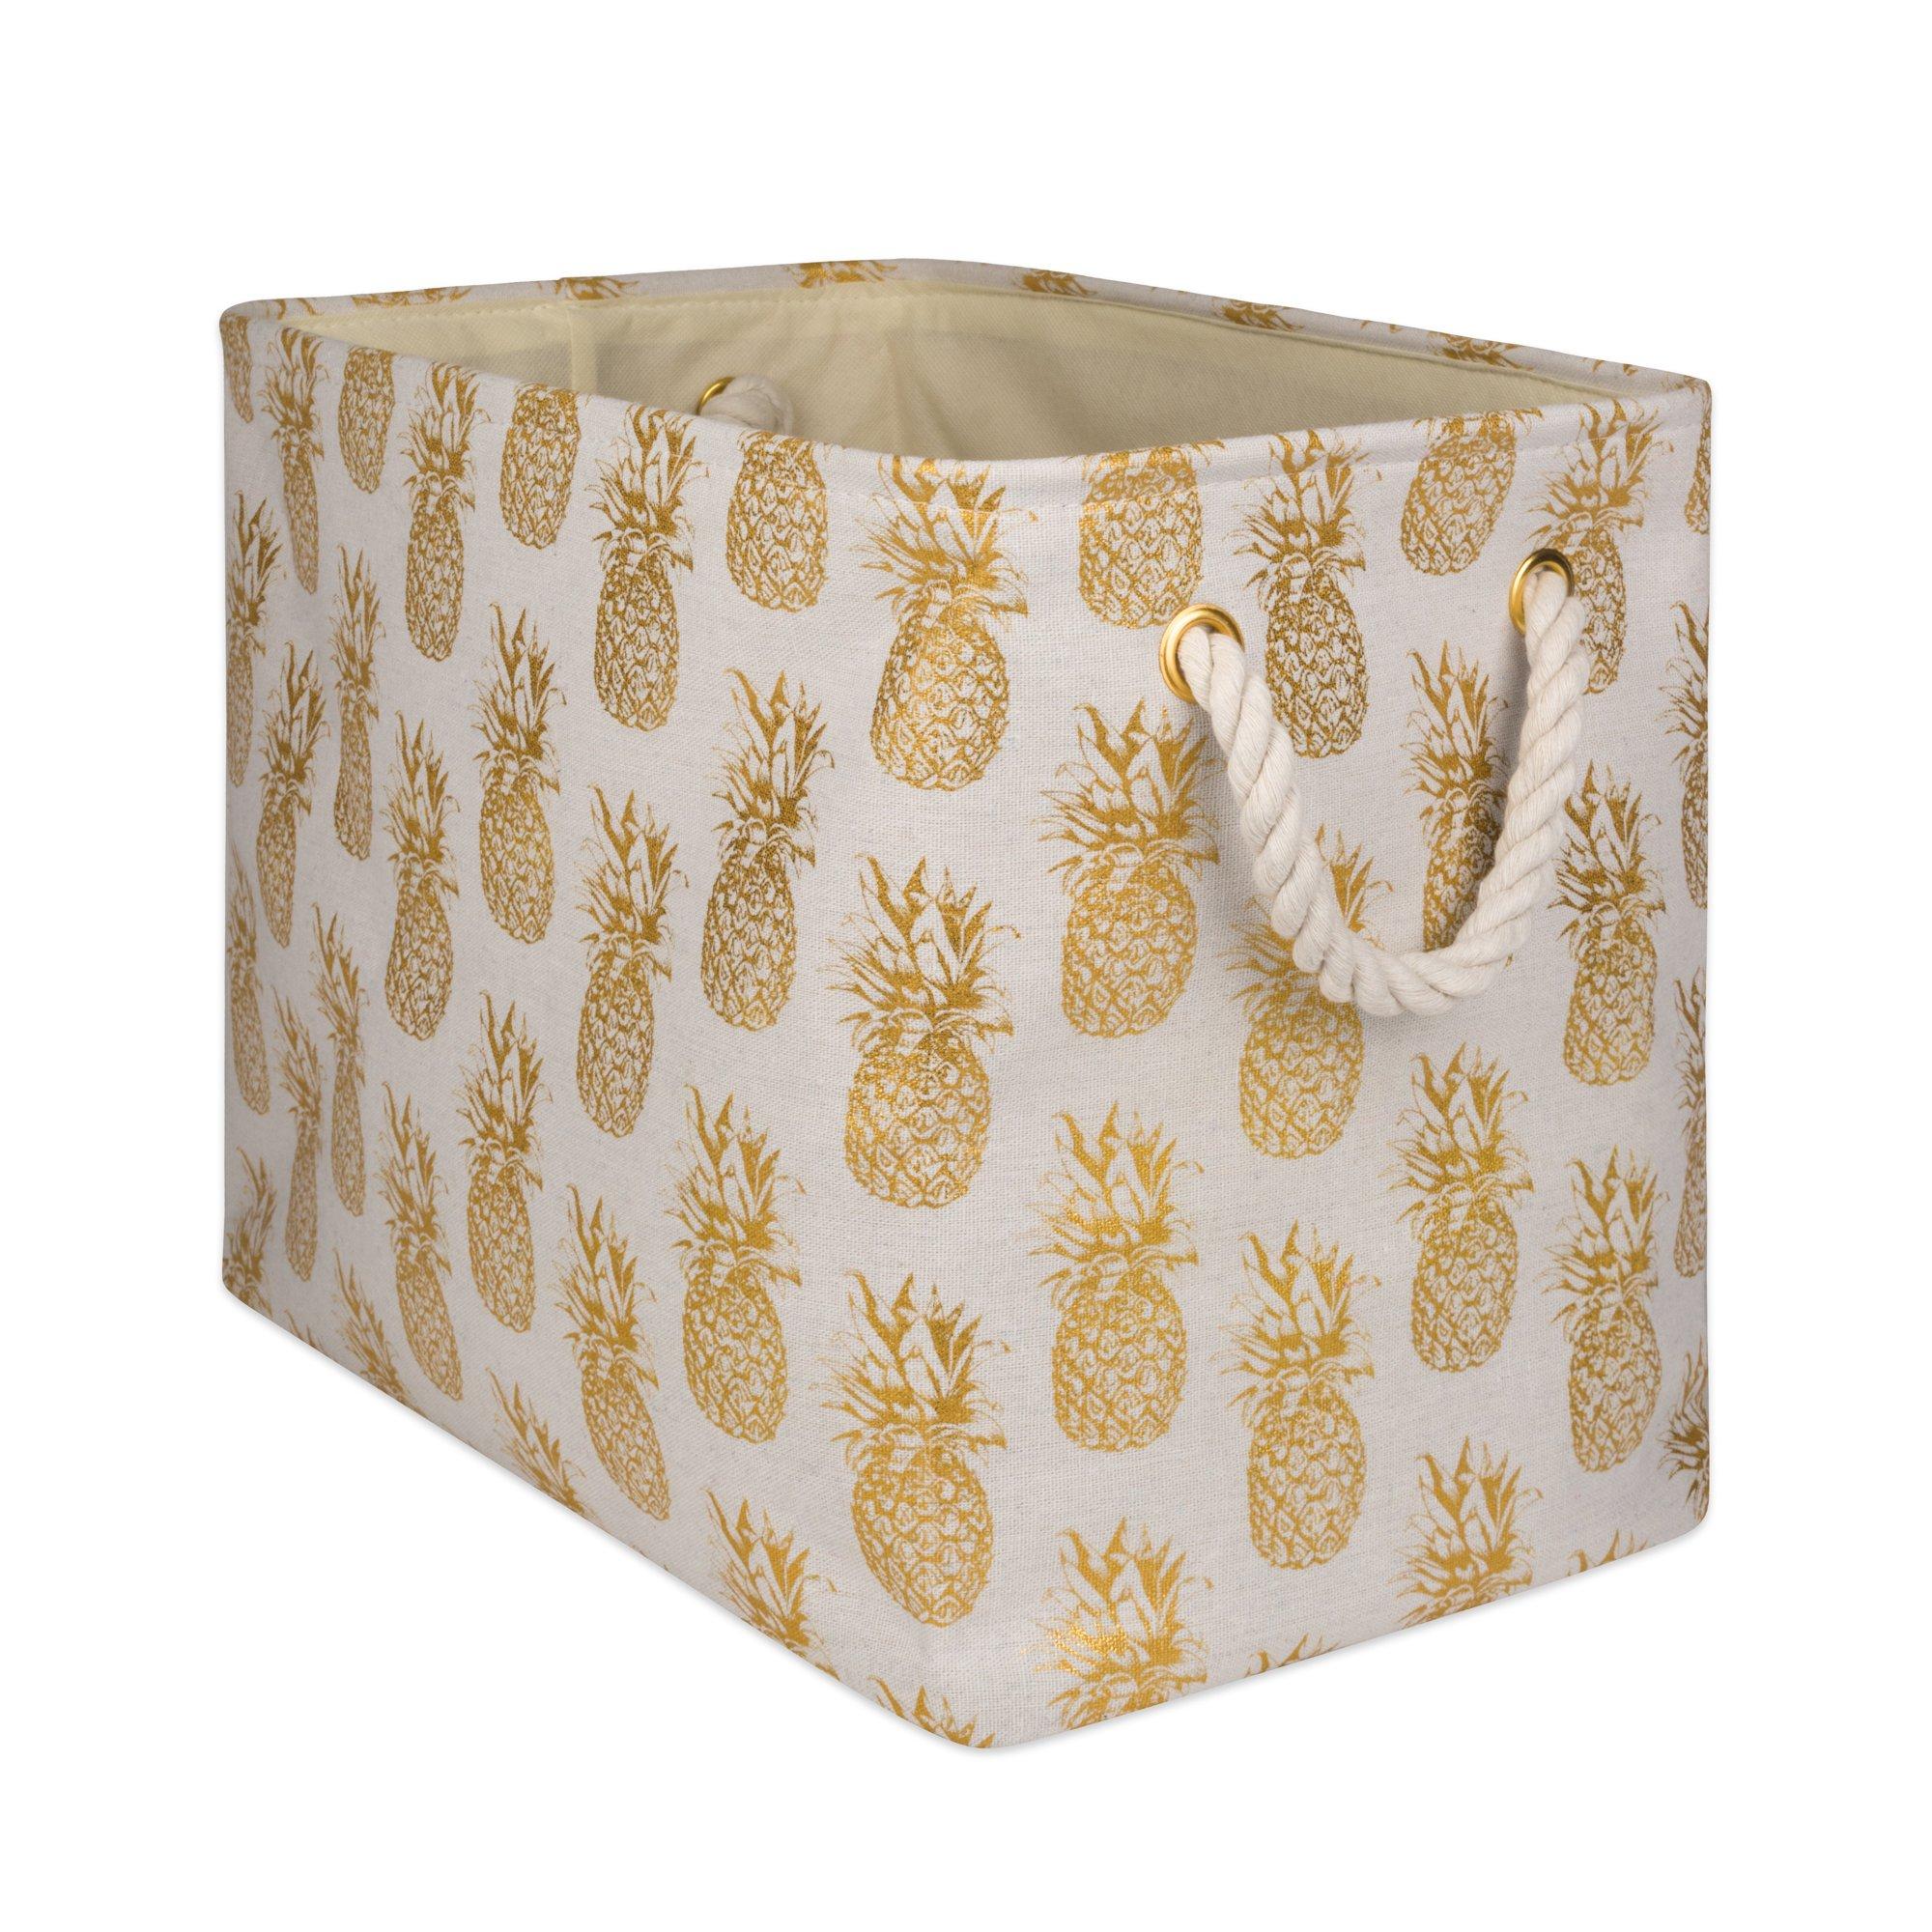 "DII CAMZ10364 Polyester Storage Bins, 18x12x15"", Pineapple"